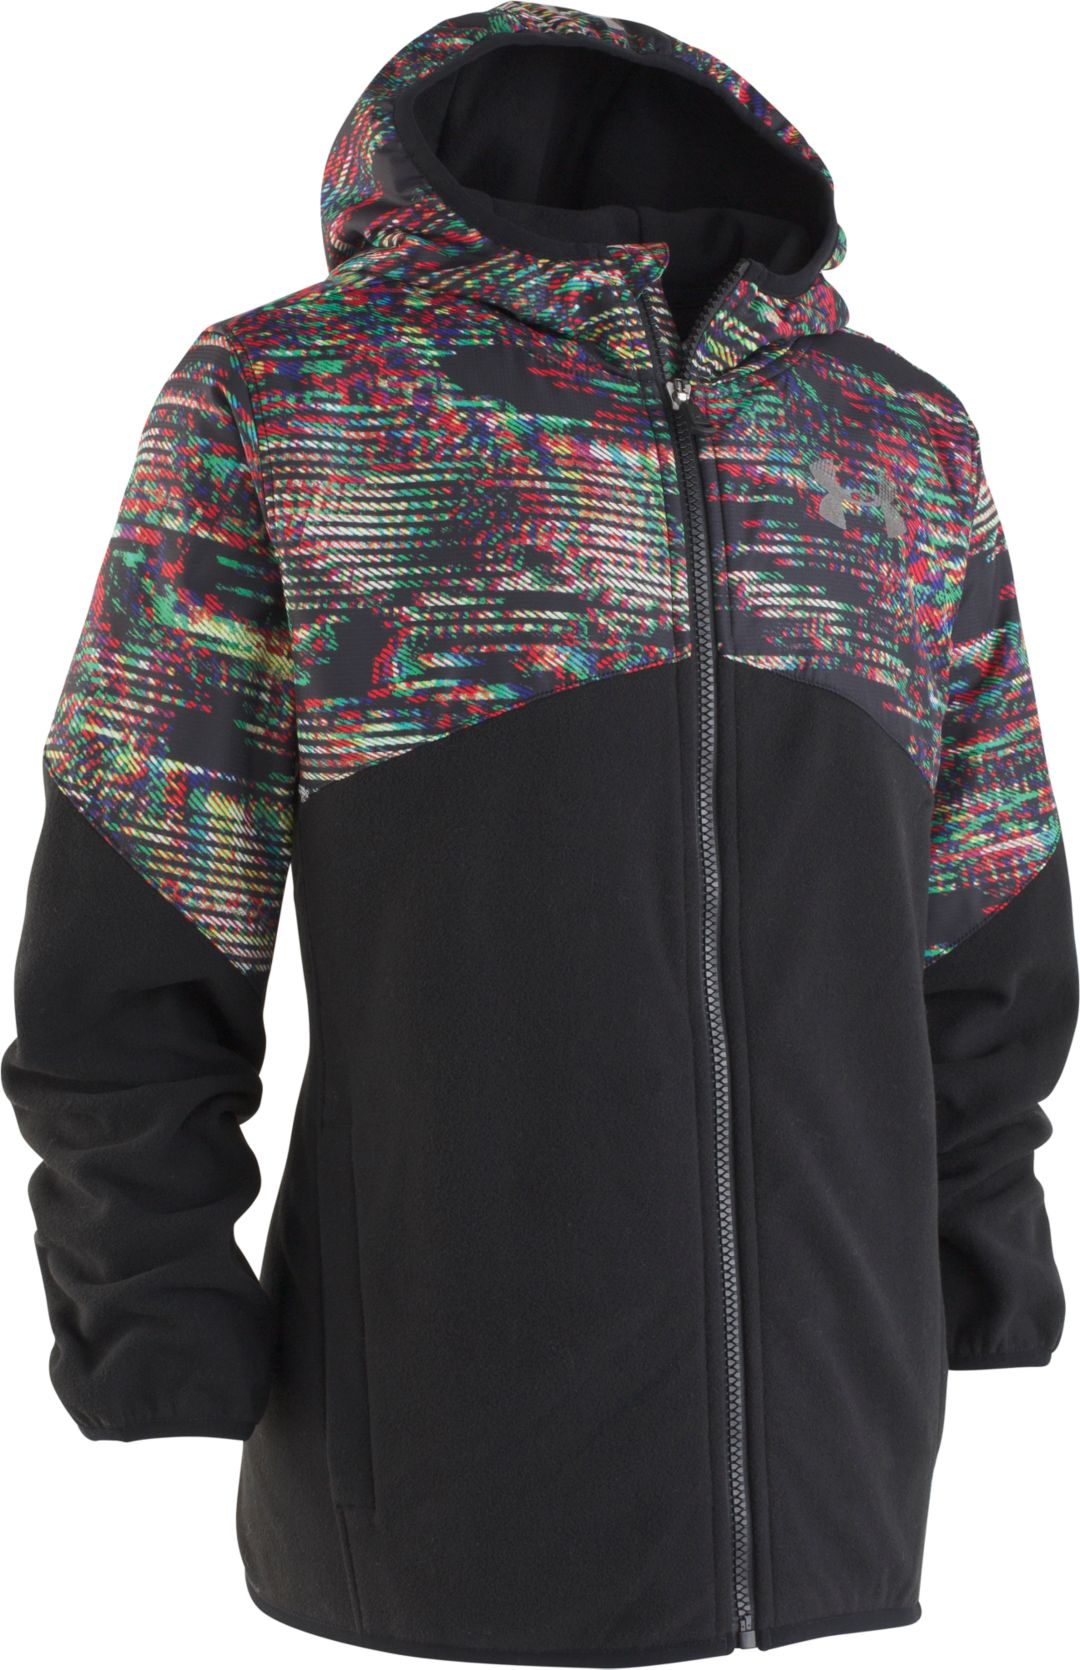 73f51c7206 Under Armour Boys' North Rim Microfleece Jacket